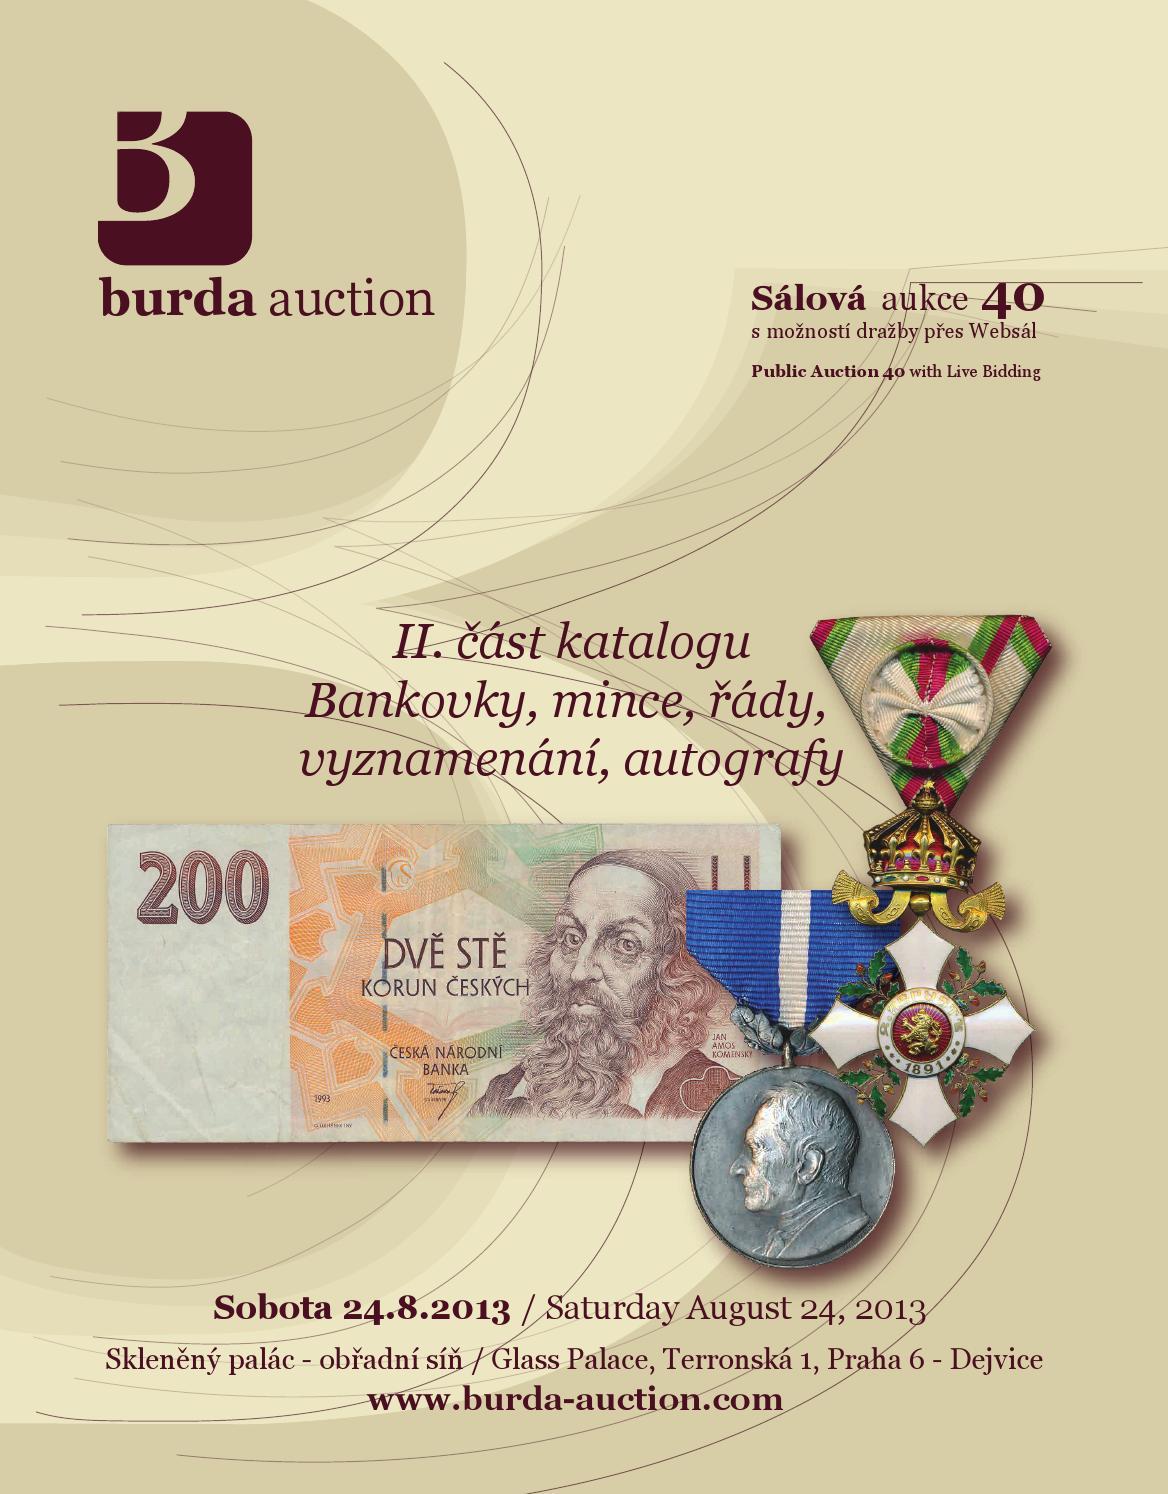 a878c32e4 Public Auction 40 - Auction catalogue - Part II by Burda Auction s.r.o. -  issuu